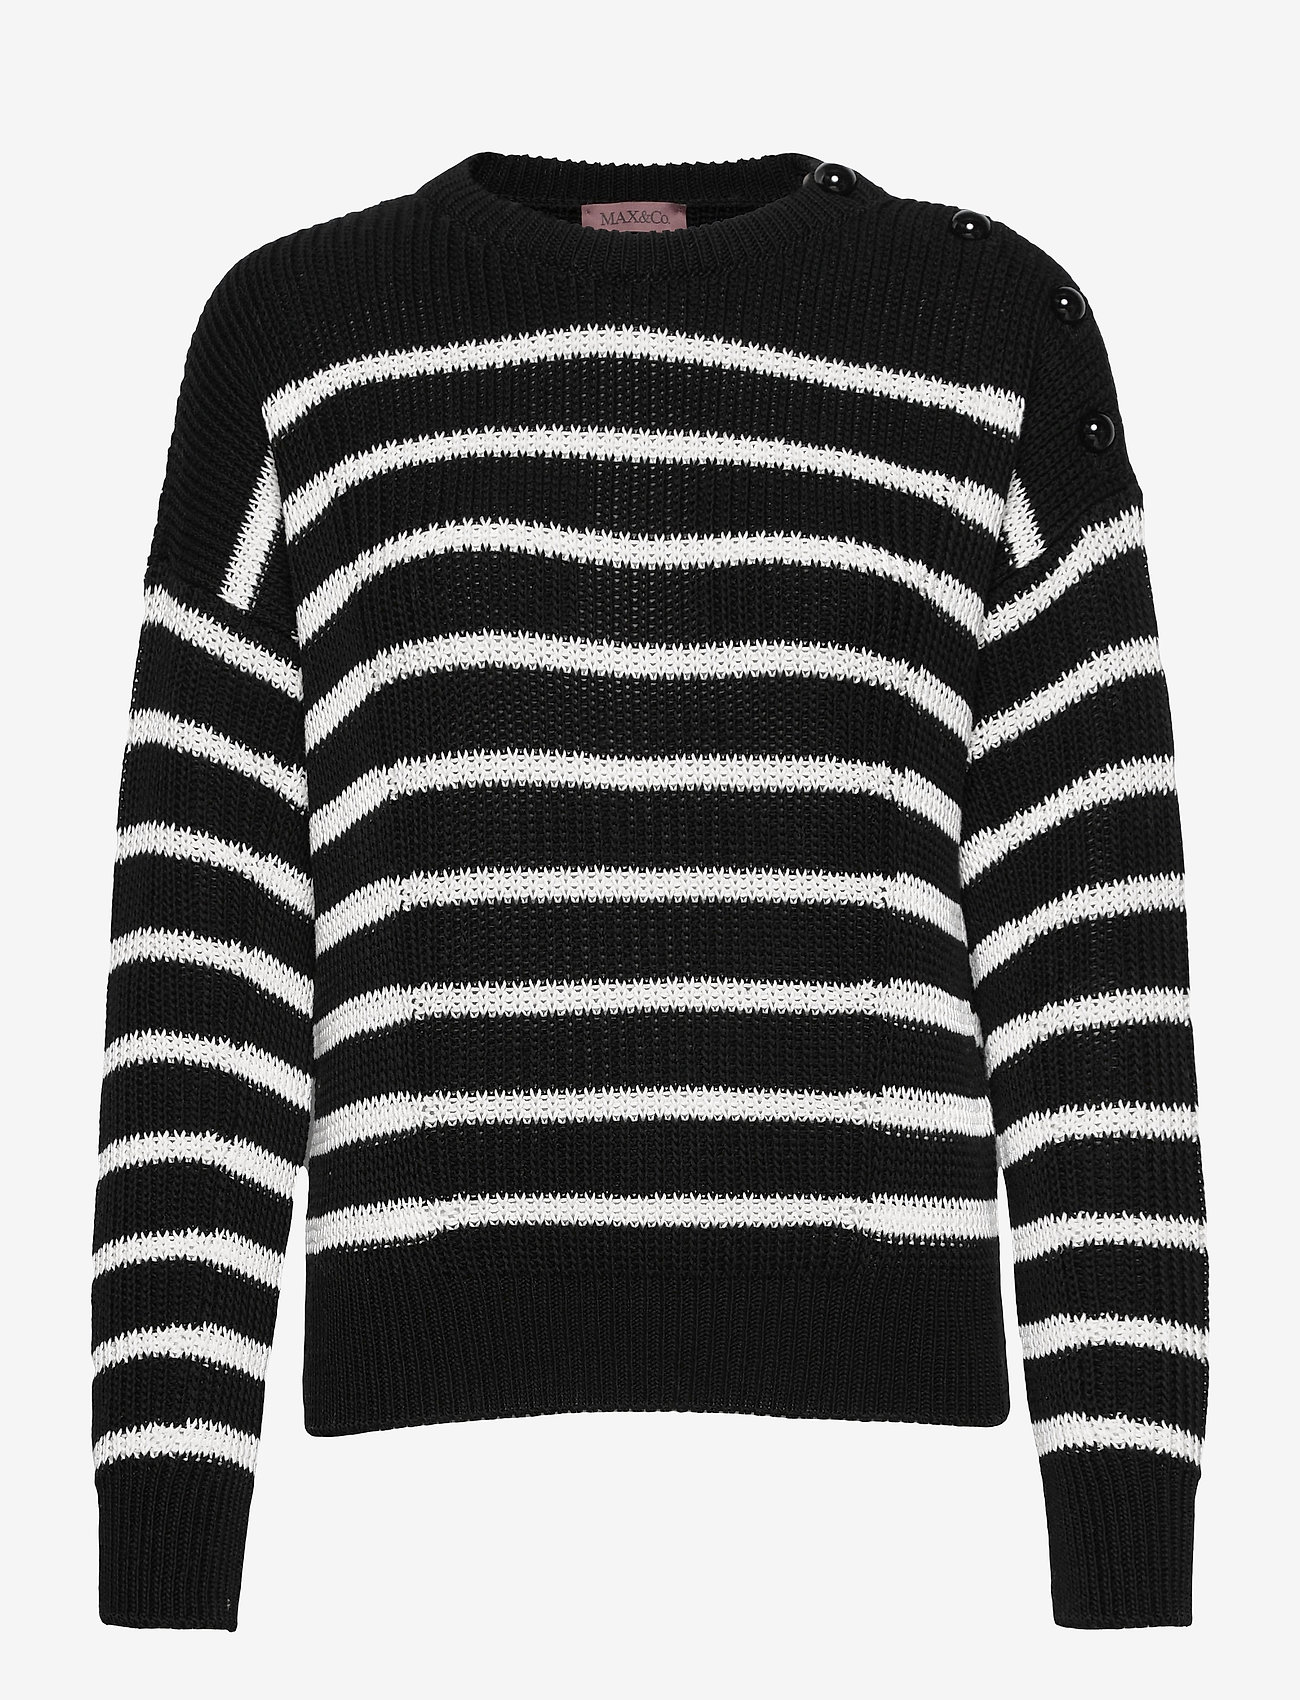 Max&Co. - COTTURA - truien - black pattern - 0